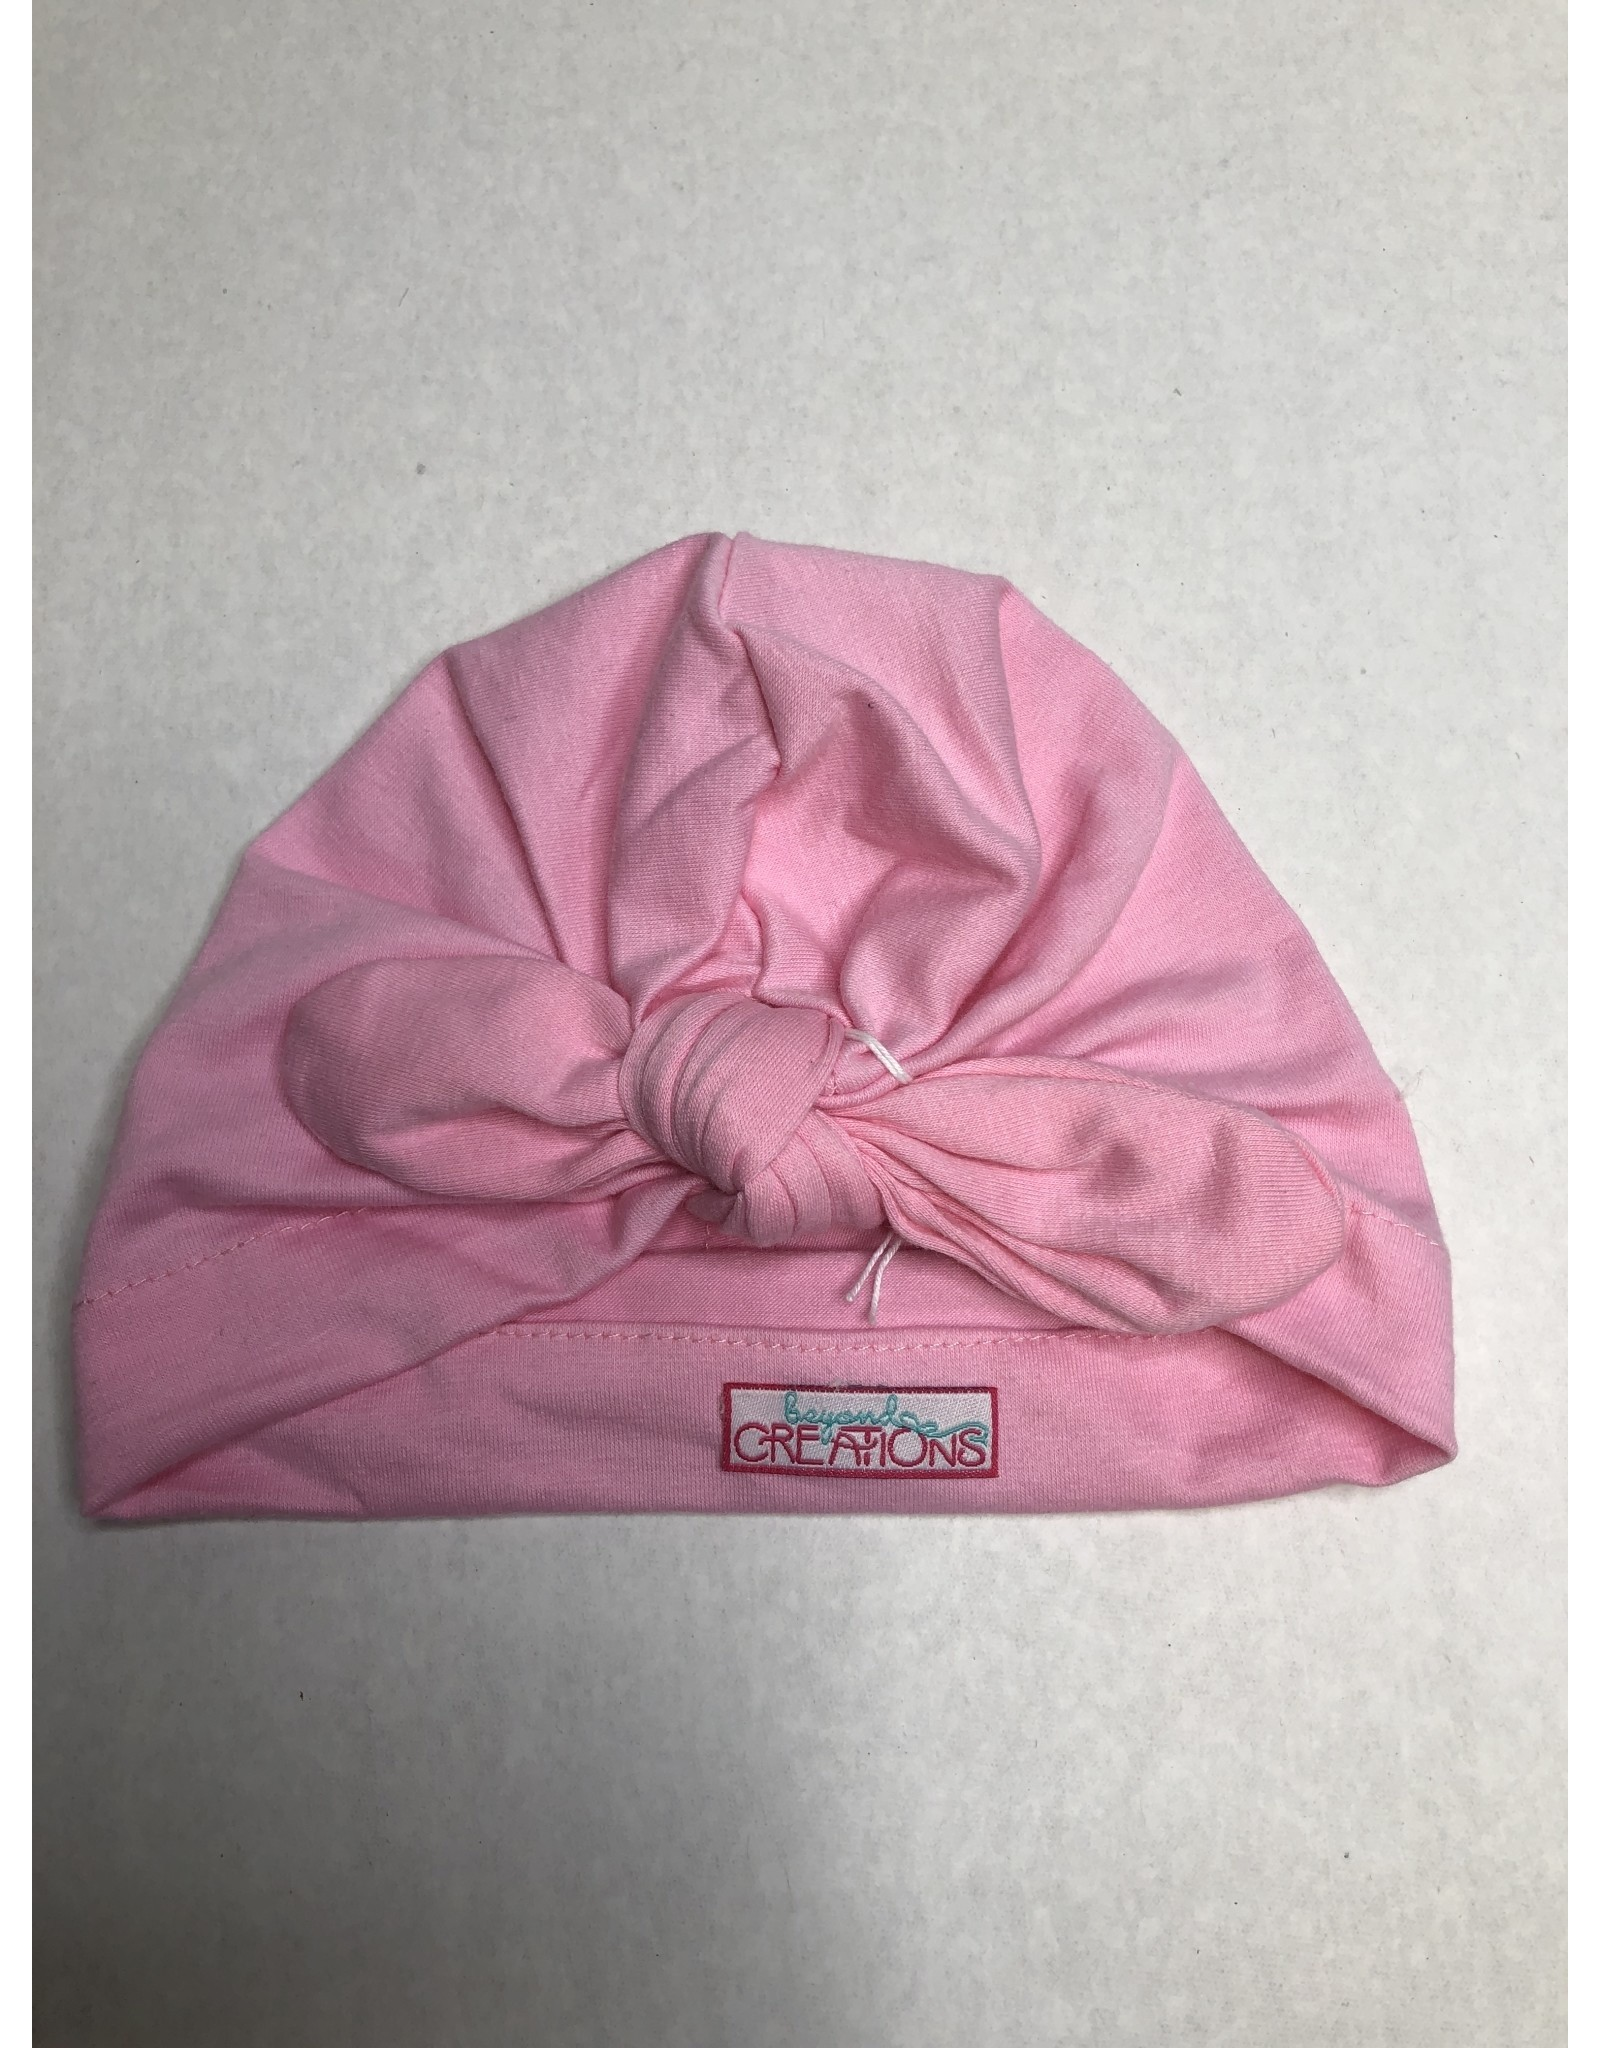 Beyond Creations Girl's Turban Hat w Knot Bow-Bubblegum PNK